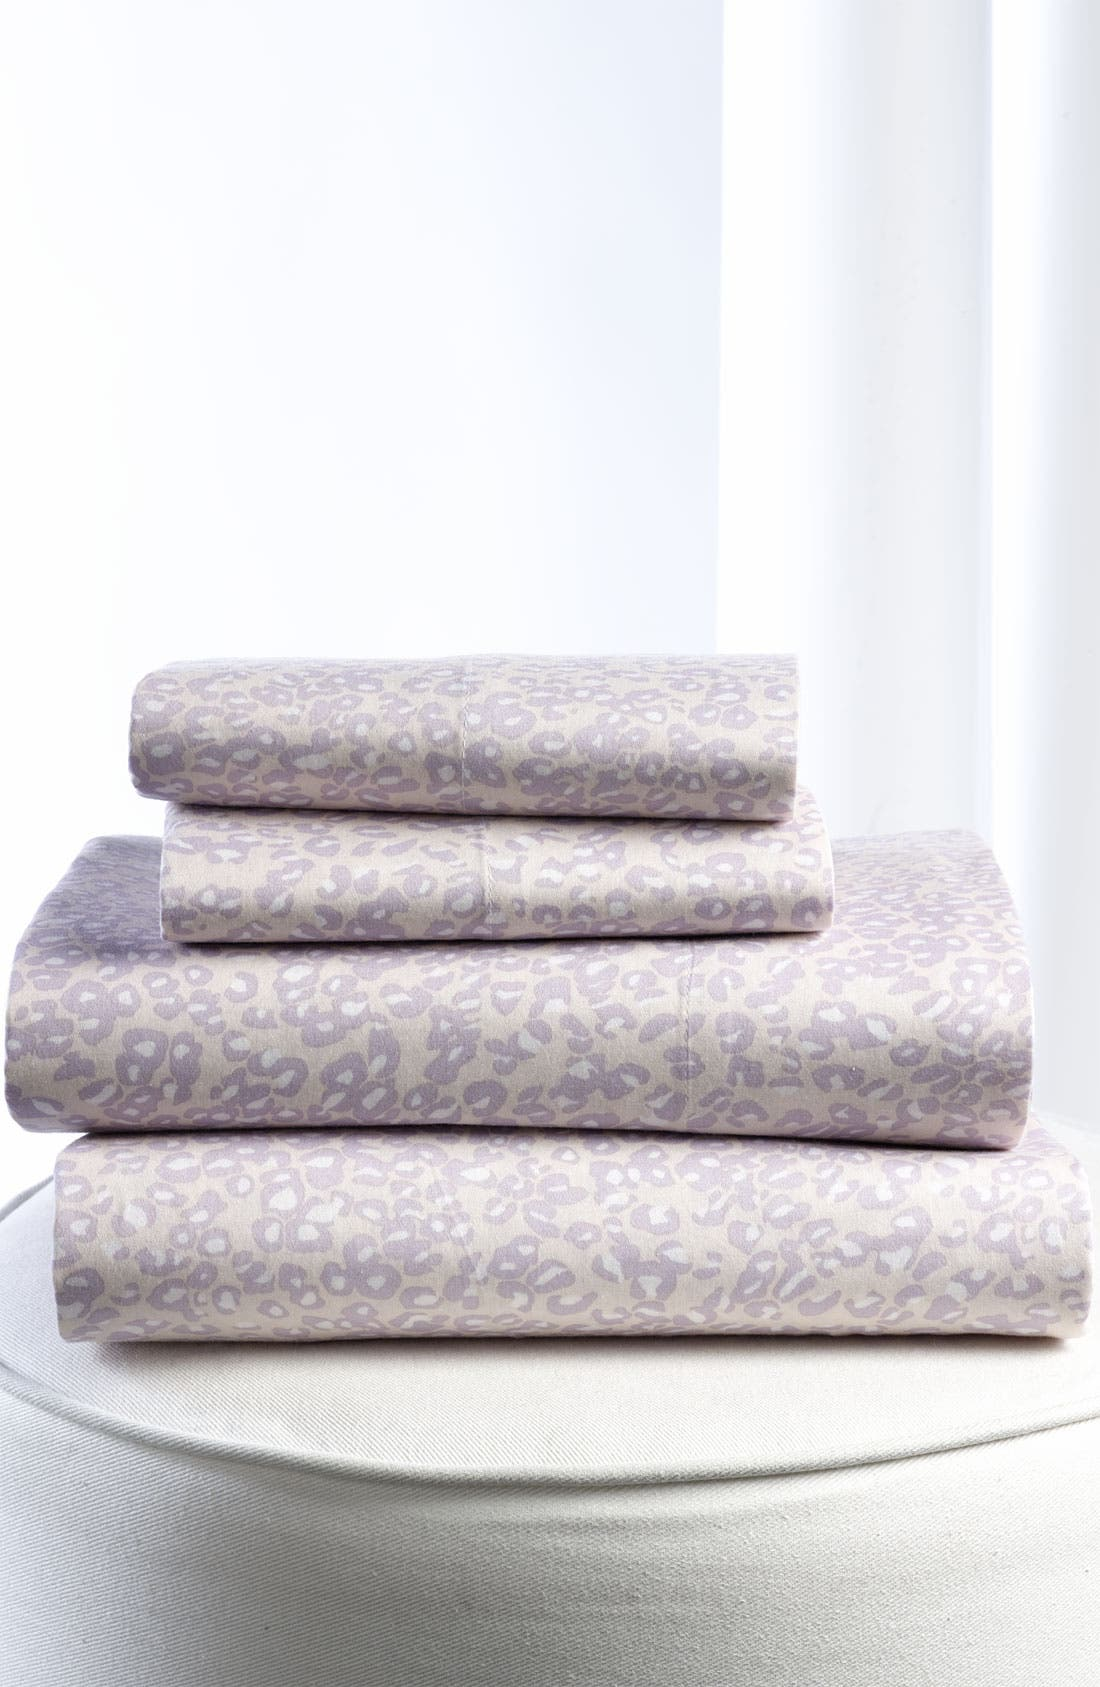 Alternate Image 1 Selected - Diane von Furstenberg 'Tiny Leopard' 300 Thread Count Flat Sheet